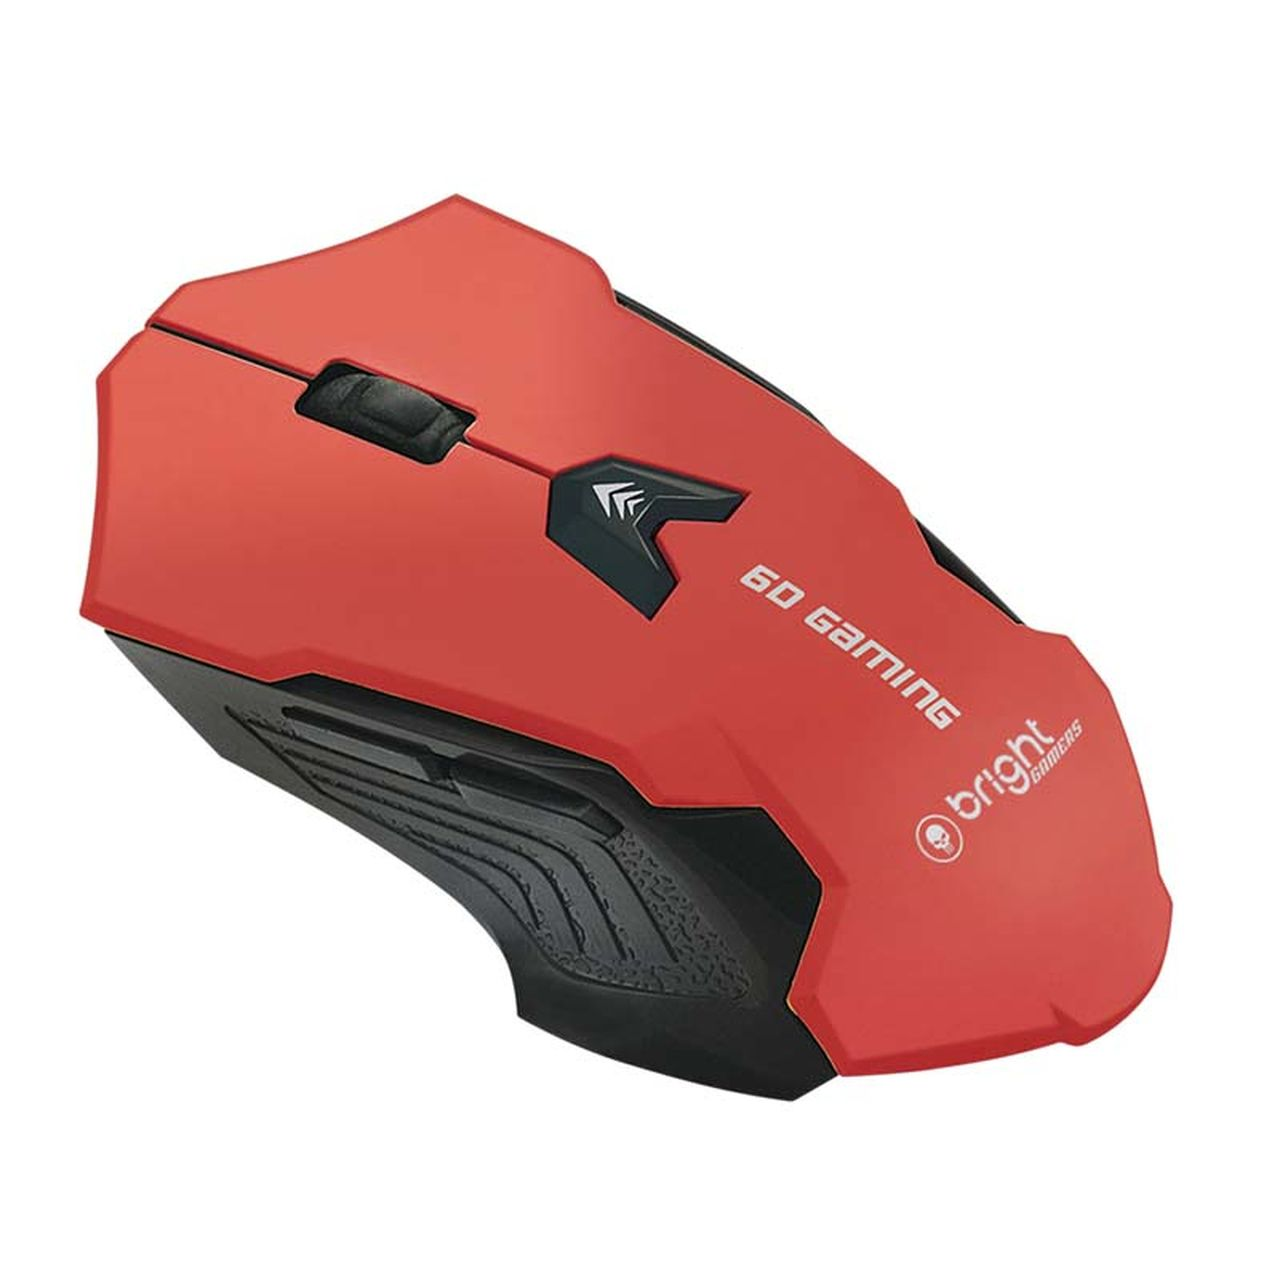 Mouse Gamer USB Vermelho 461 - Bright